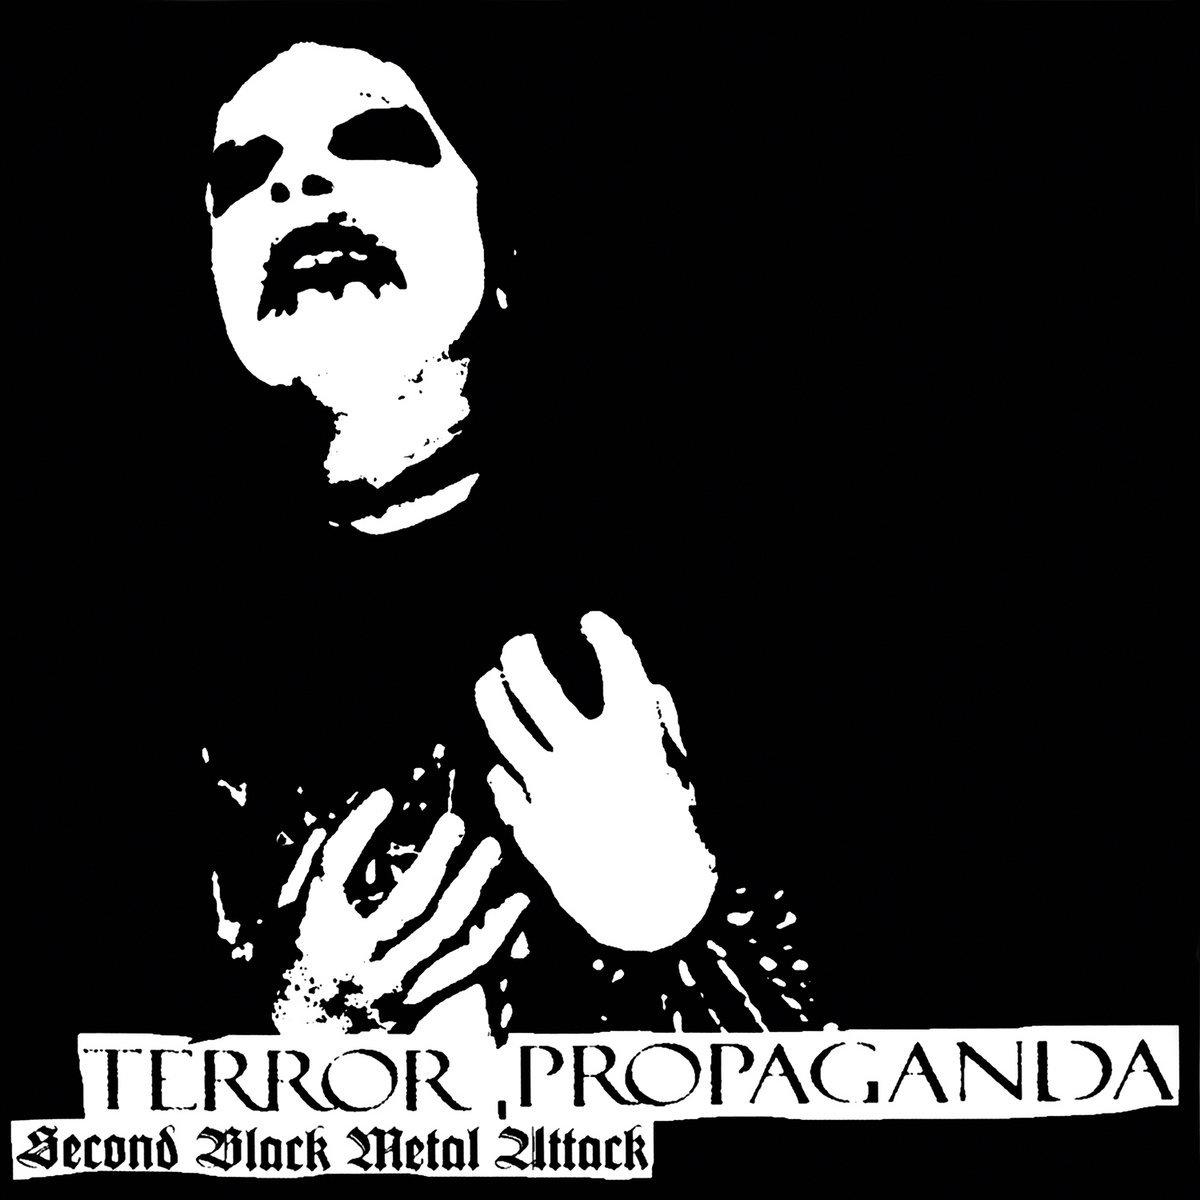 CRAFT-TERRORPROPAGANDA.jpg